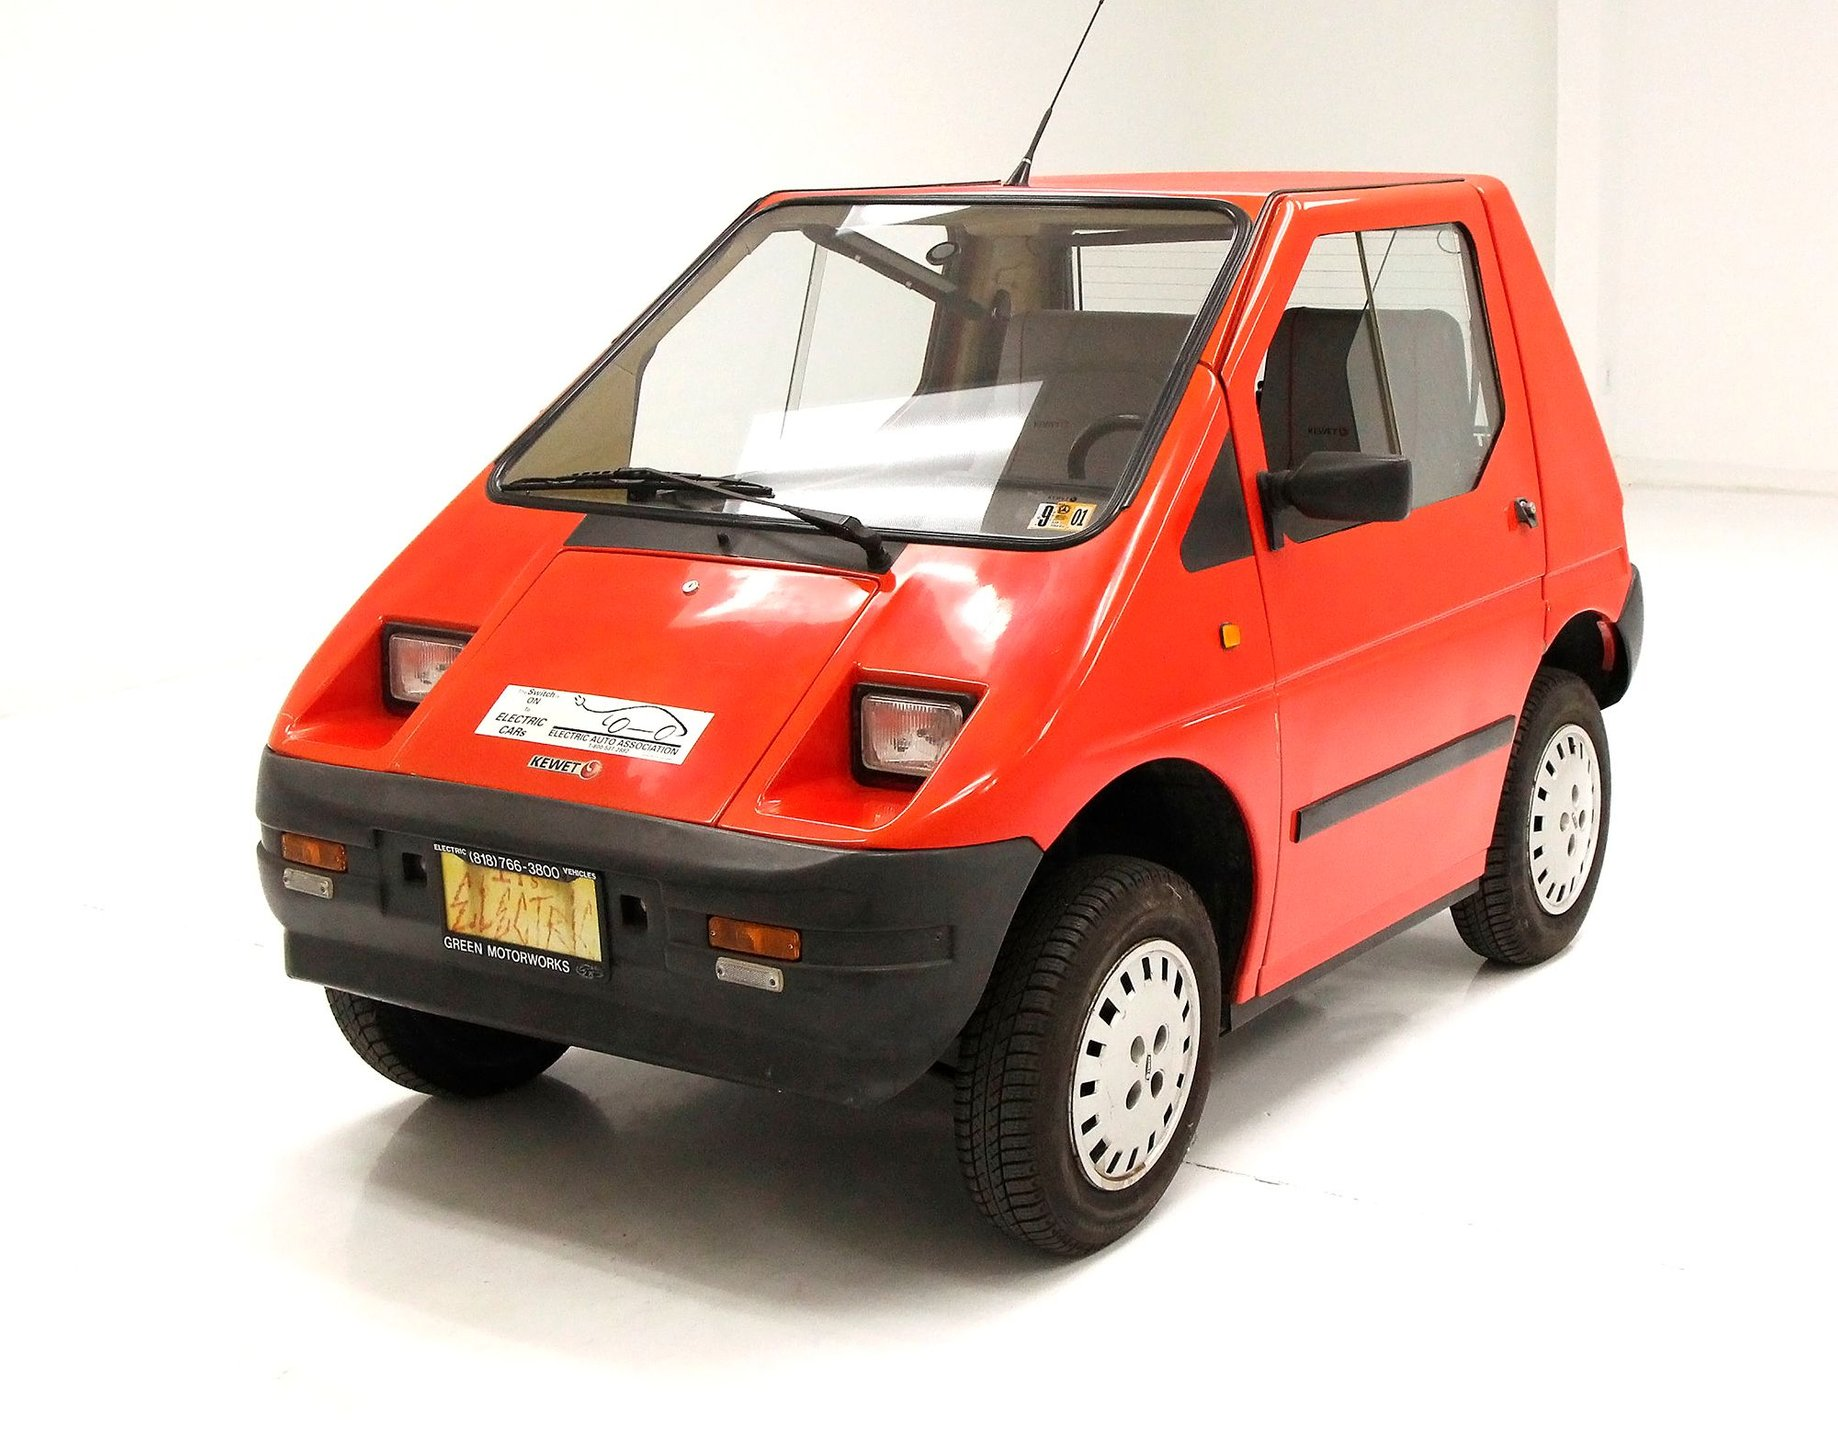 1993 Kewet Electric Car